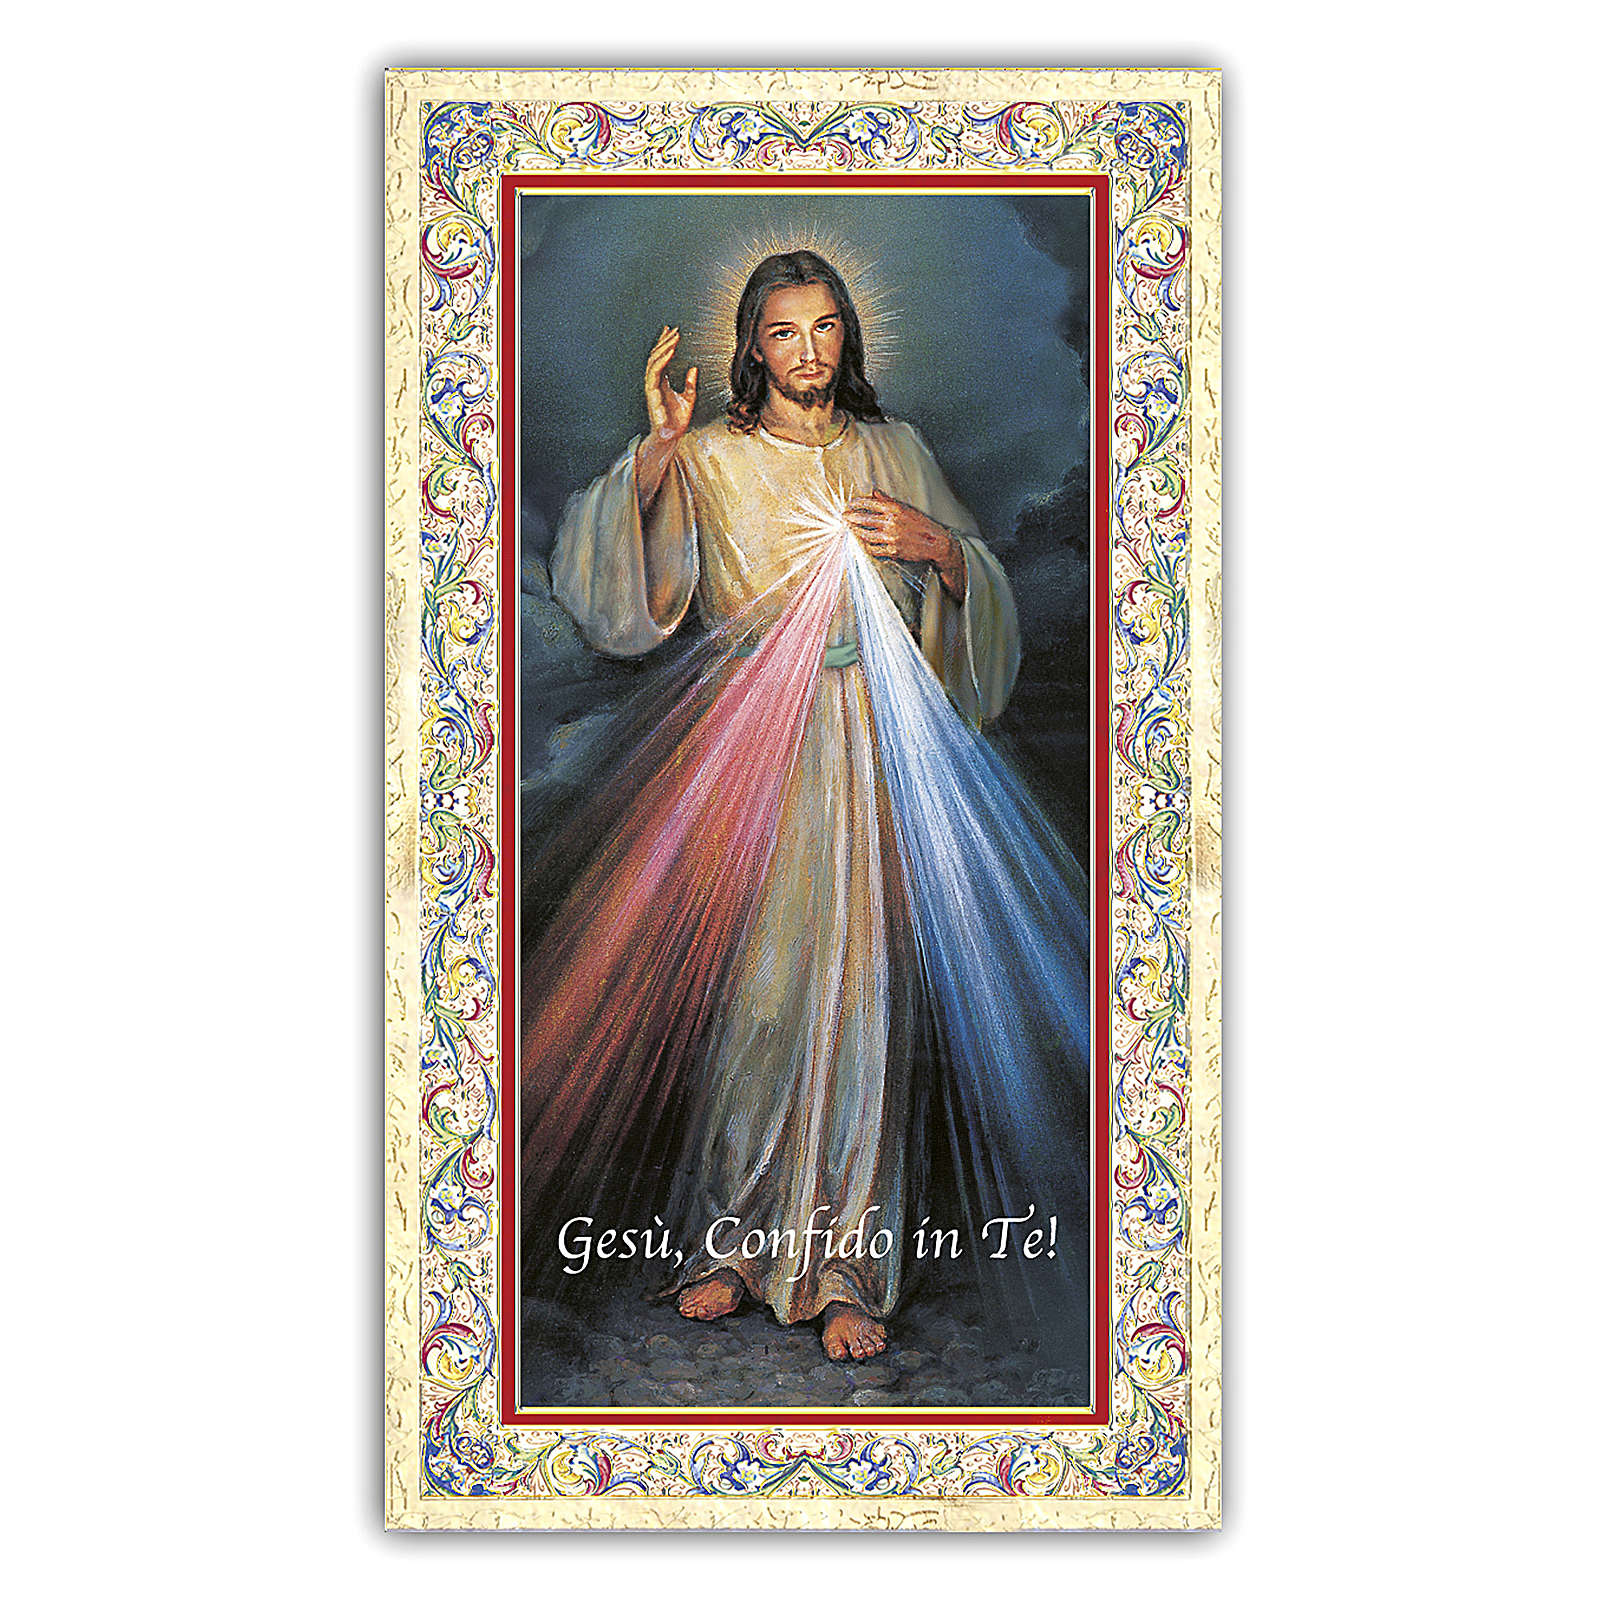 Estampa religiosa Jesús Misericordioso 10x5 cm ITA 4